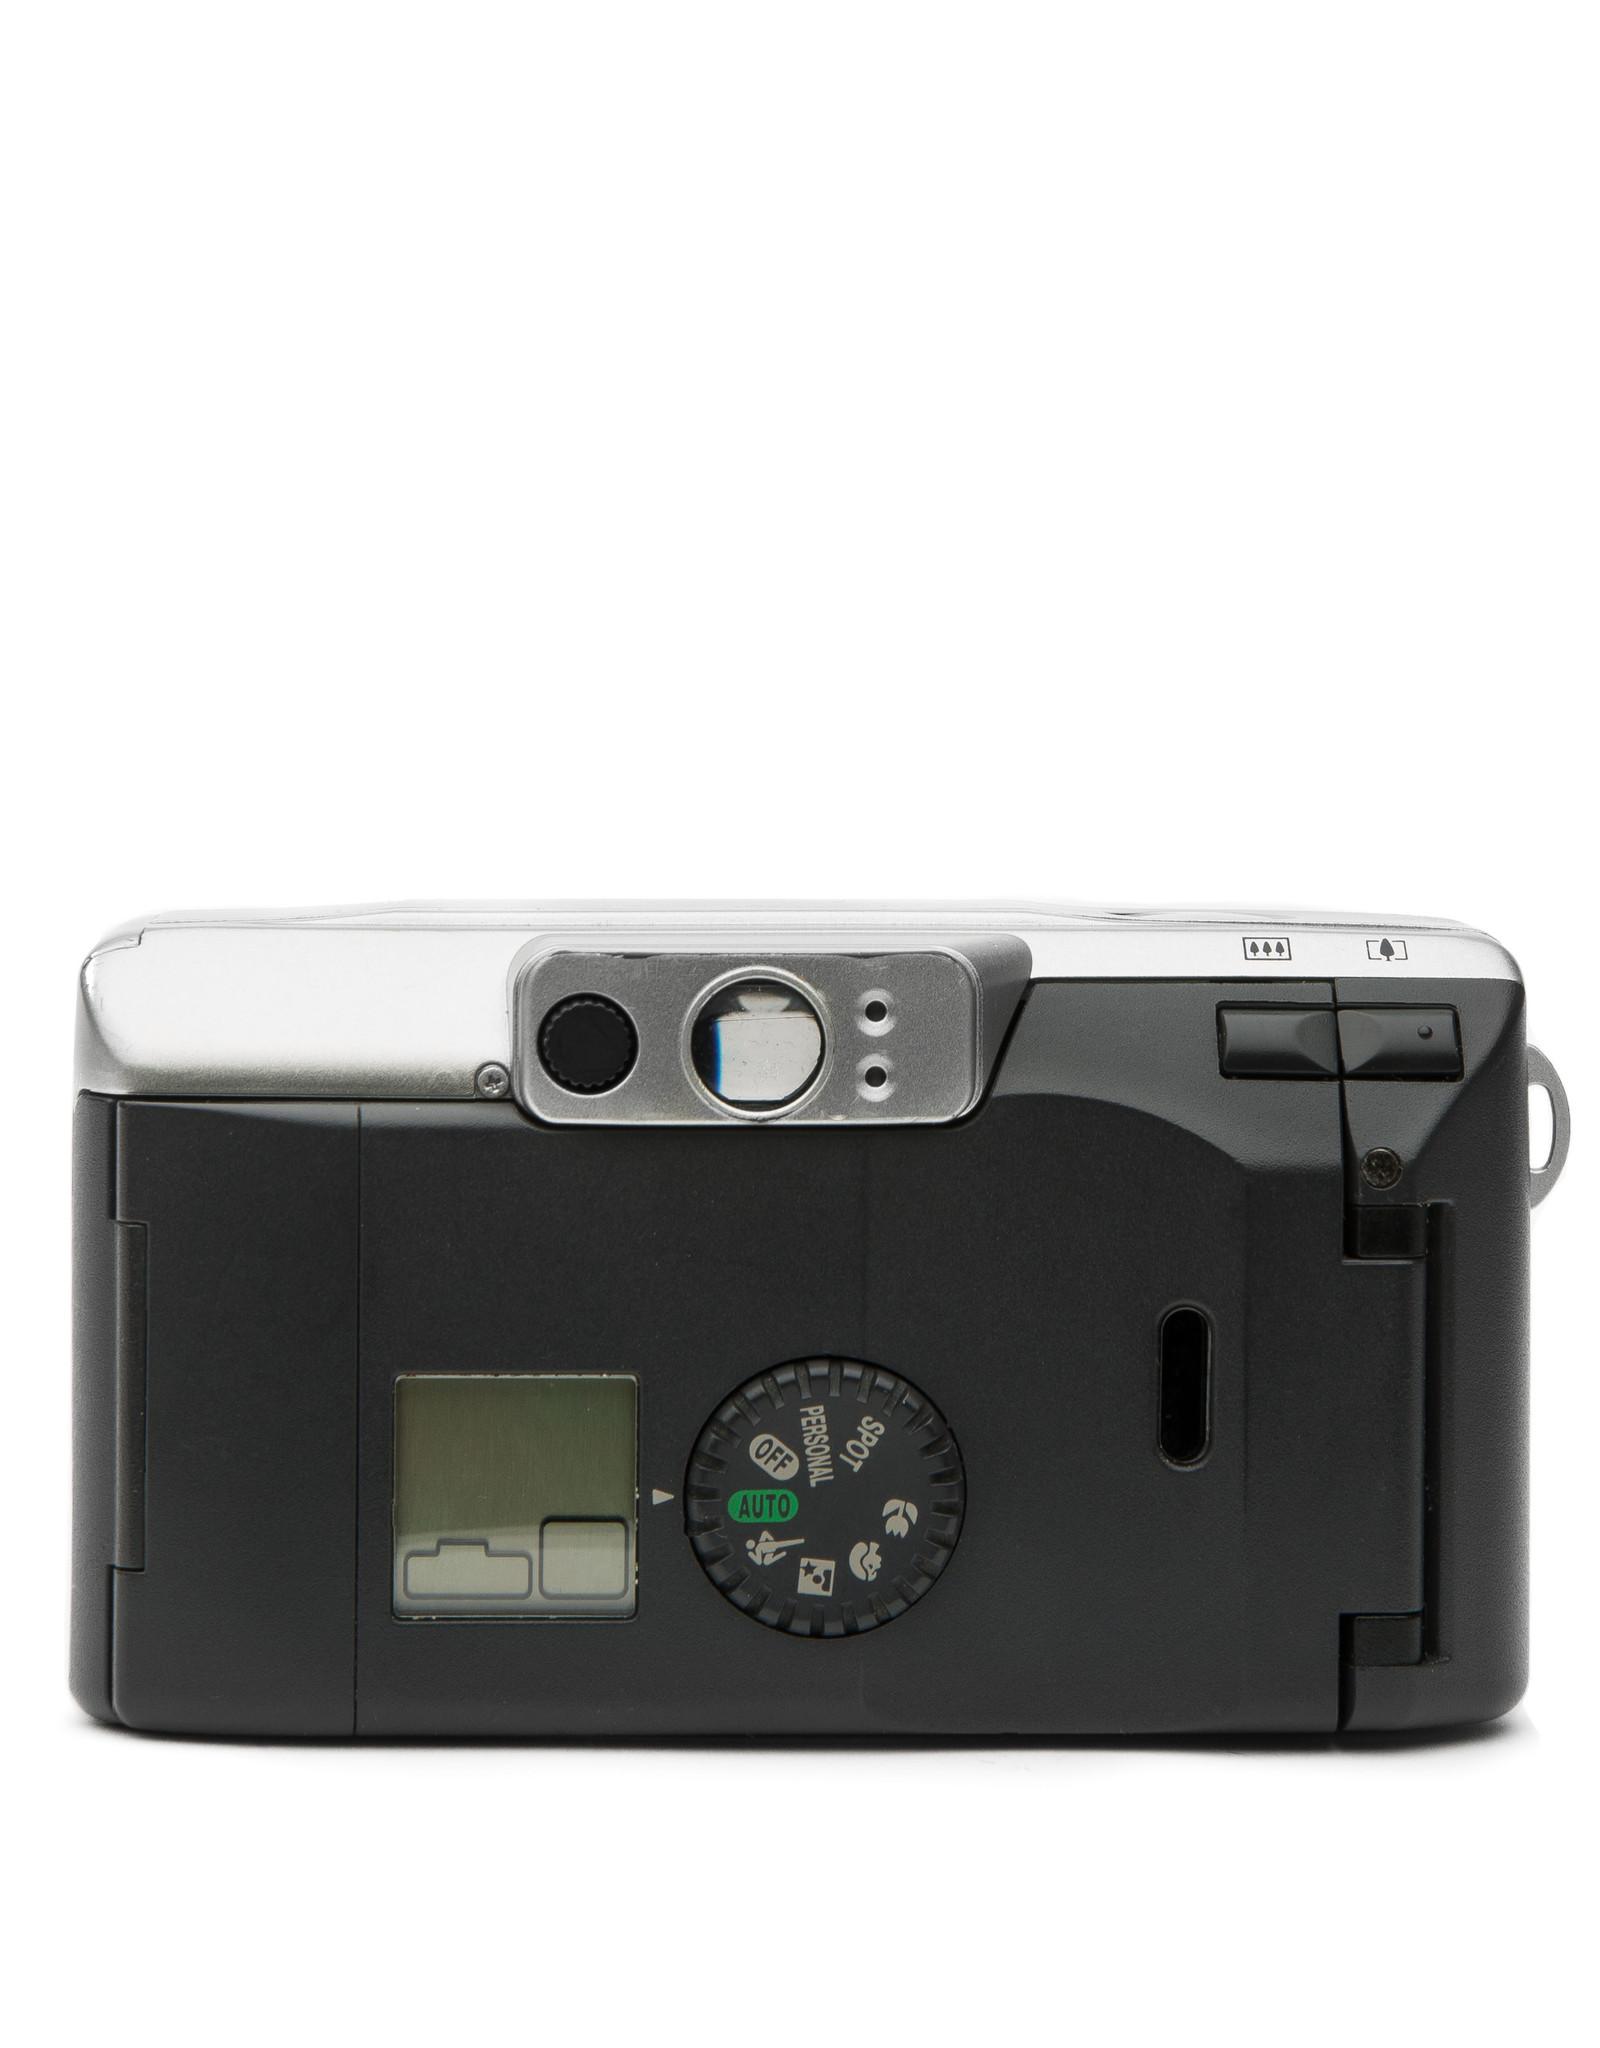 Canon Canon Sureshot Classic 120 Point & Shoot 35mm Camera